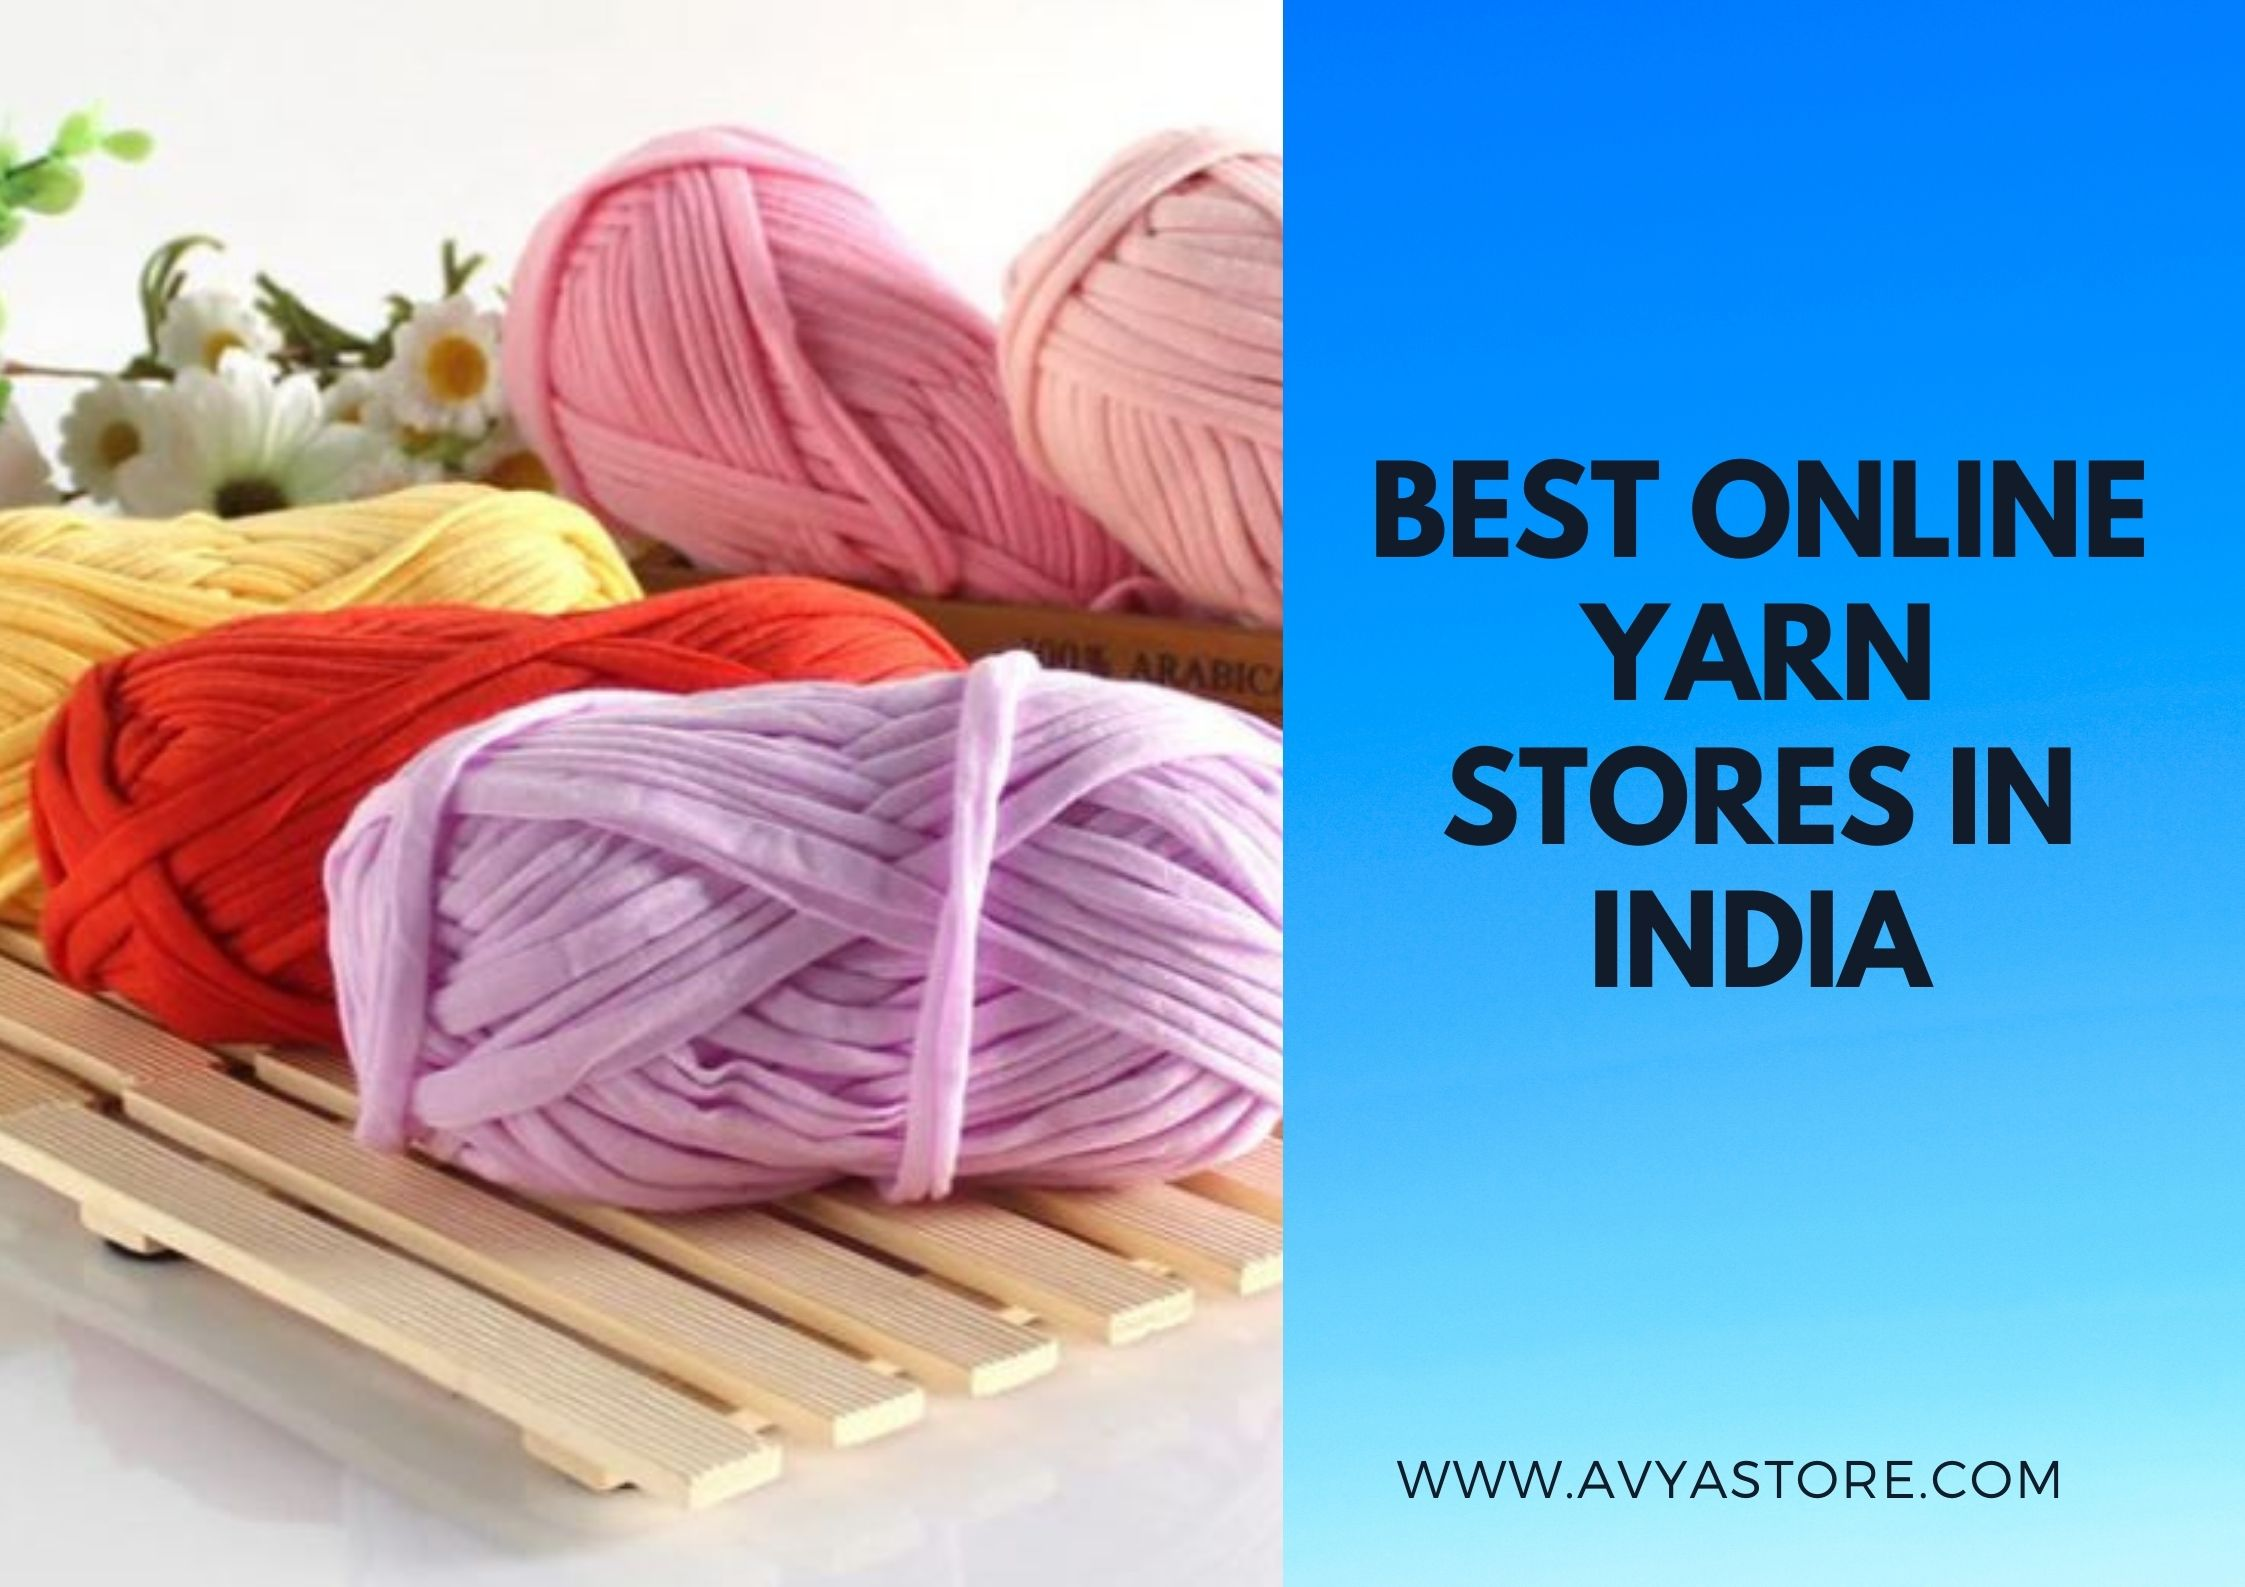 Best Online Yarn Stores In India